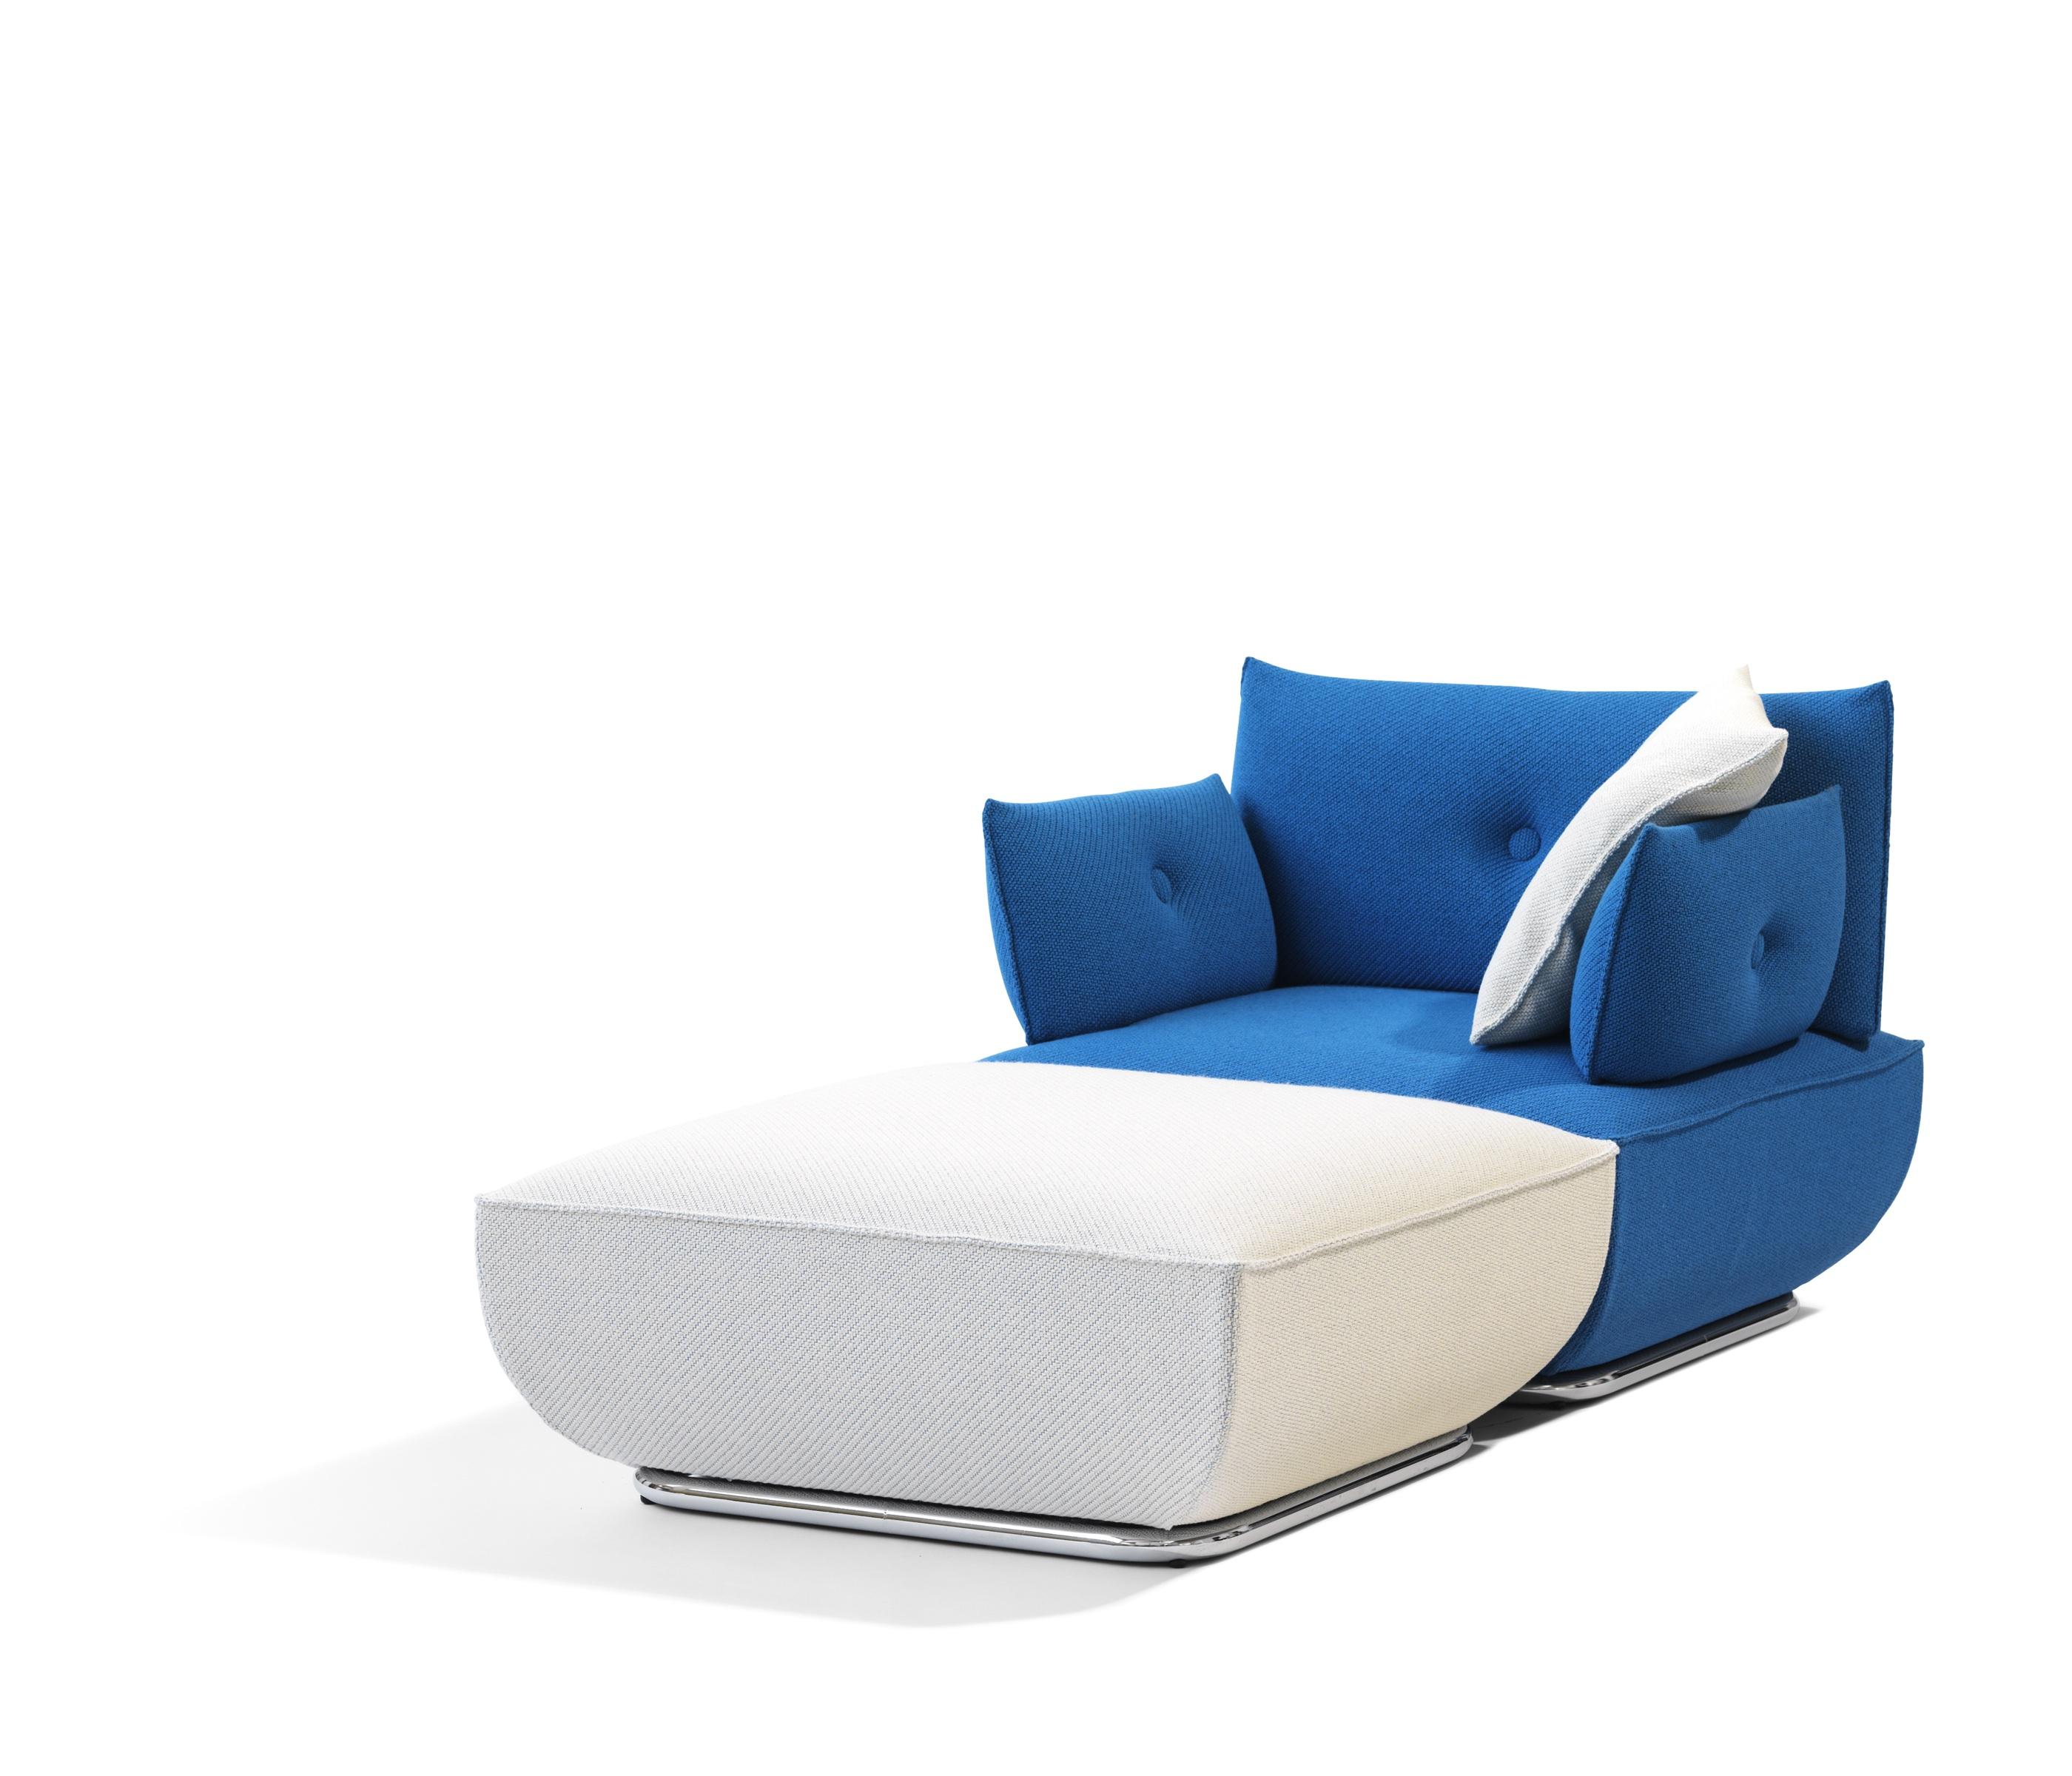 Modern Modular Sofa and Armchair with Flexible Design from Blå ...